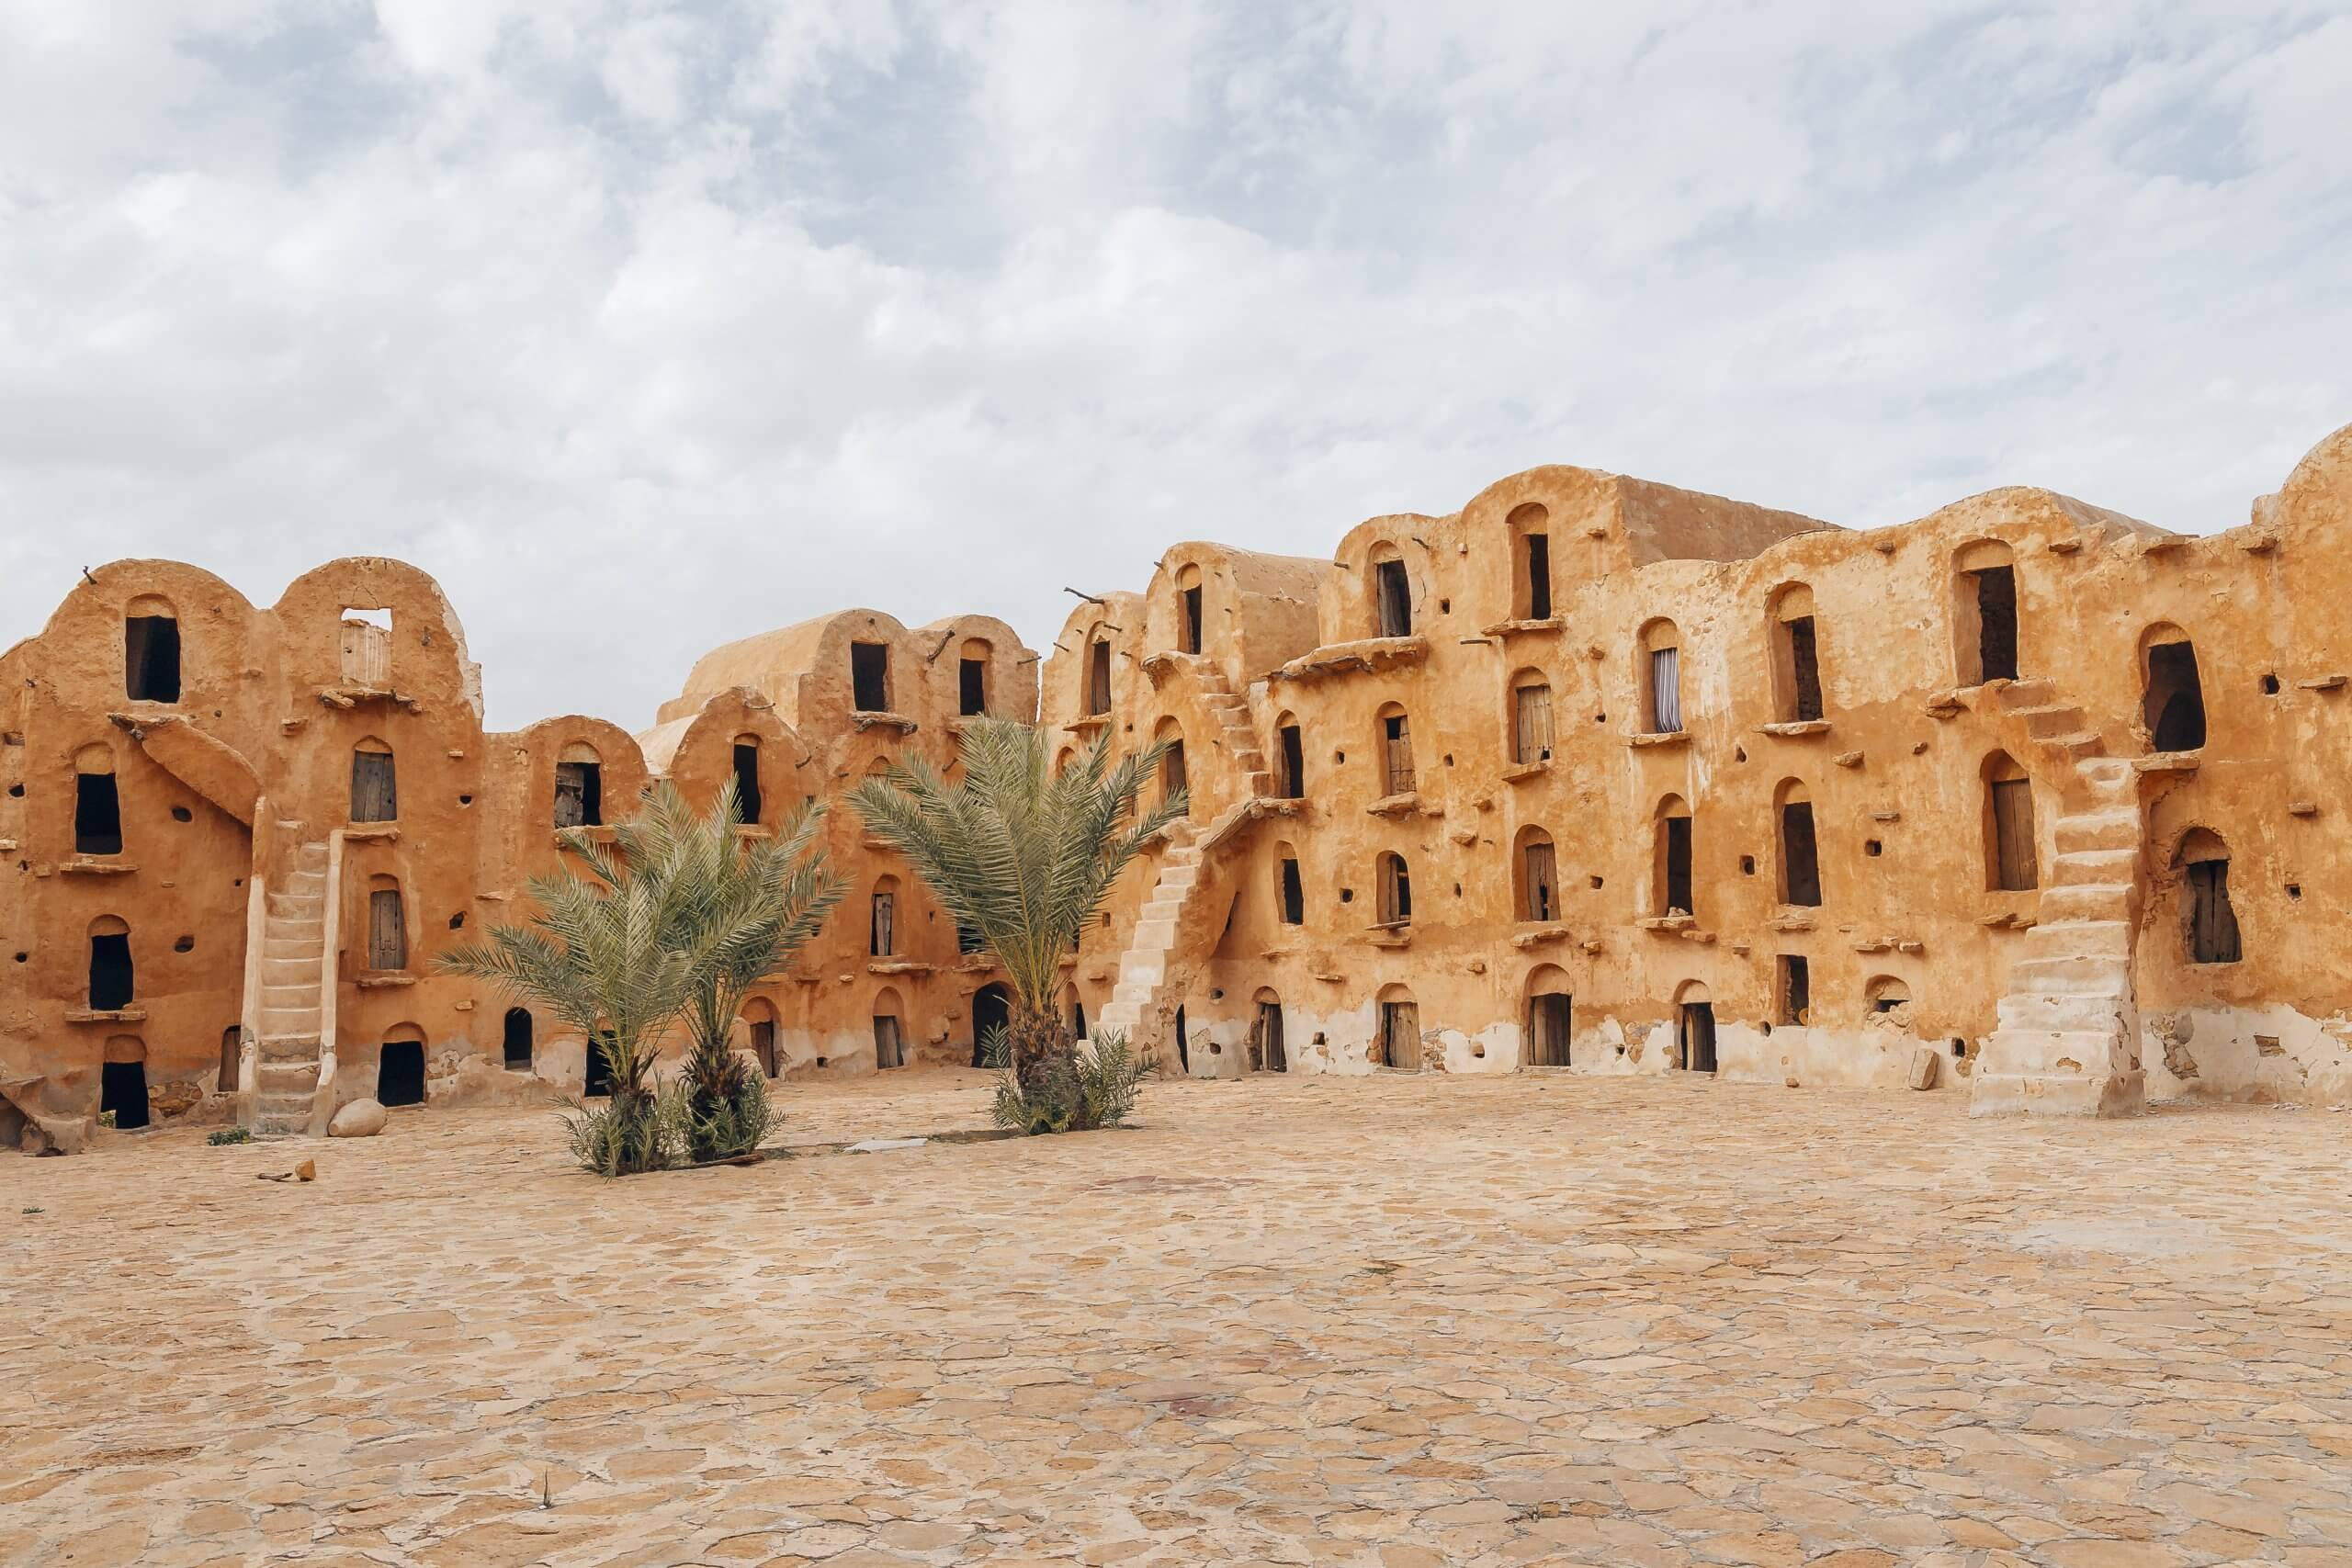 der große Innenhof des Ksar